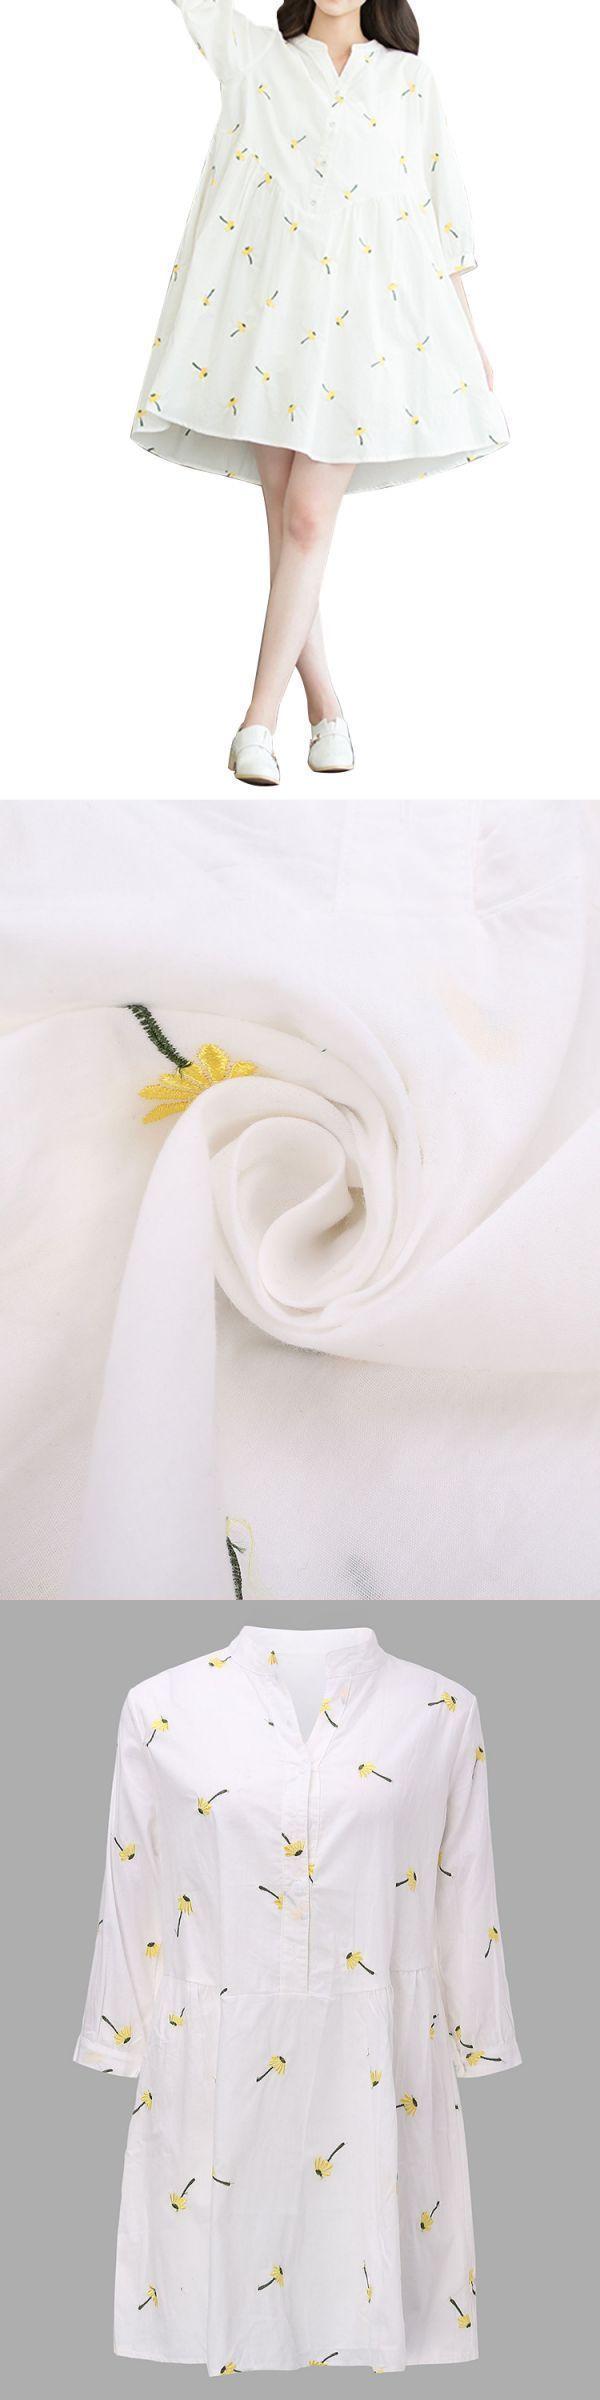 Floral dresses boho vintage flower embroidery v neck linen women mini shirt dress #floral #dresses #80s #floral #dresses #house #of #fraser #floral #dresses #online #shopping #philippines #zimmermann #floral #dress